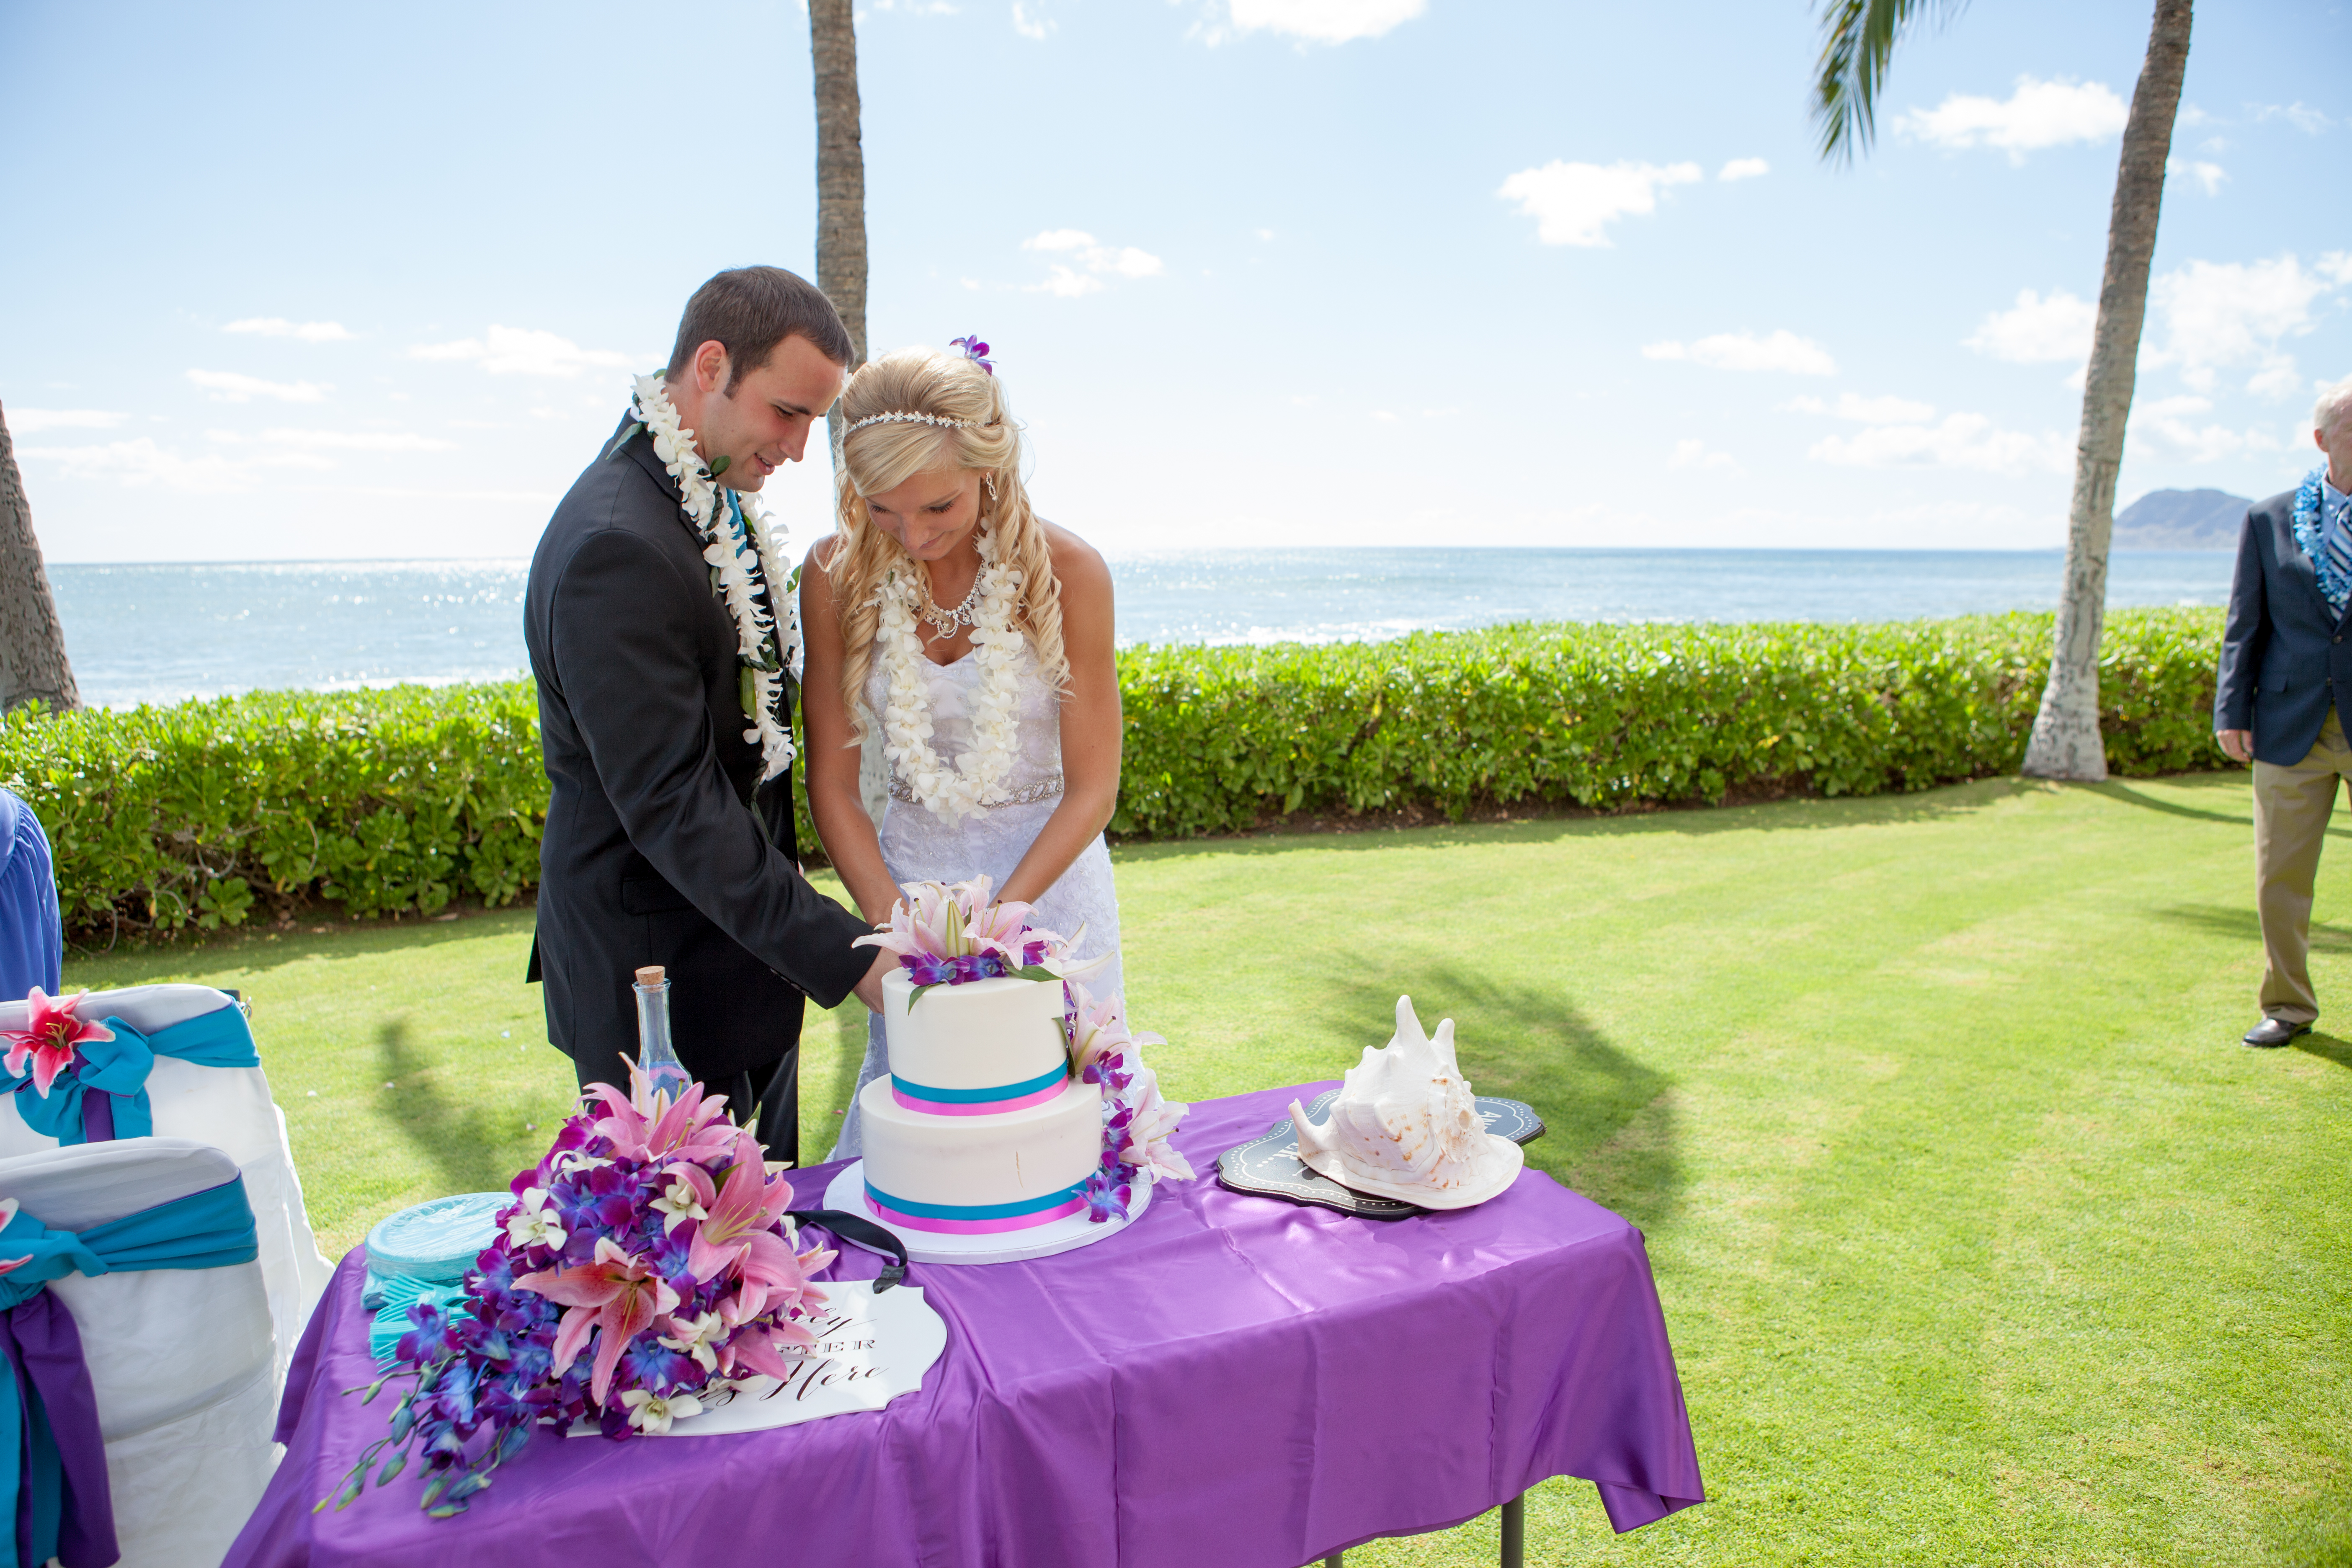 Wedding ceremony at paradise cove 5